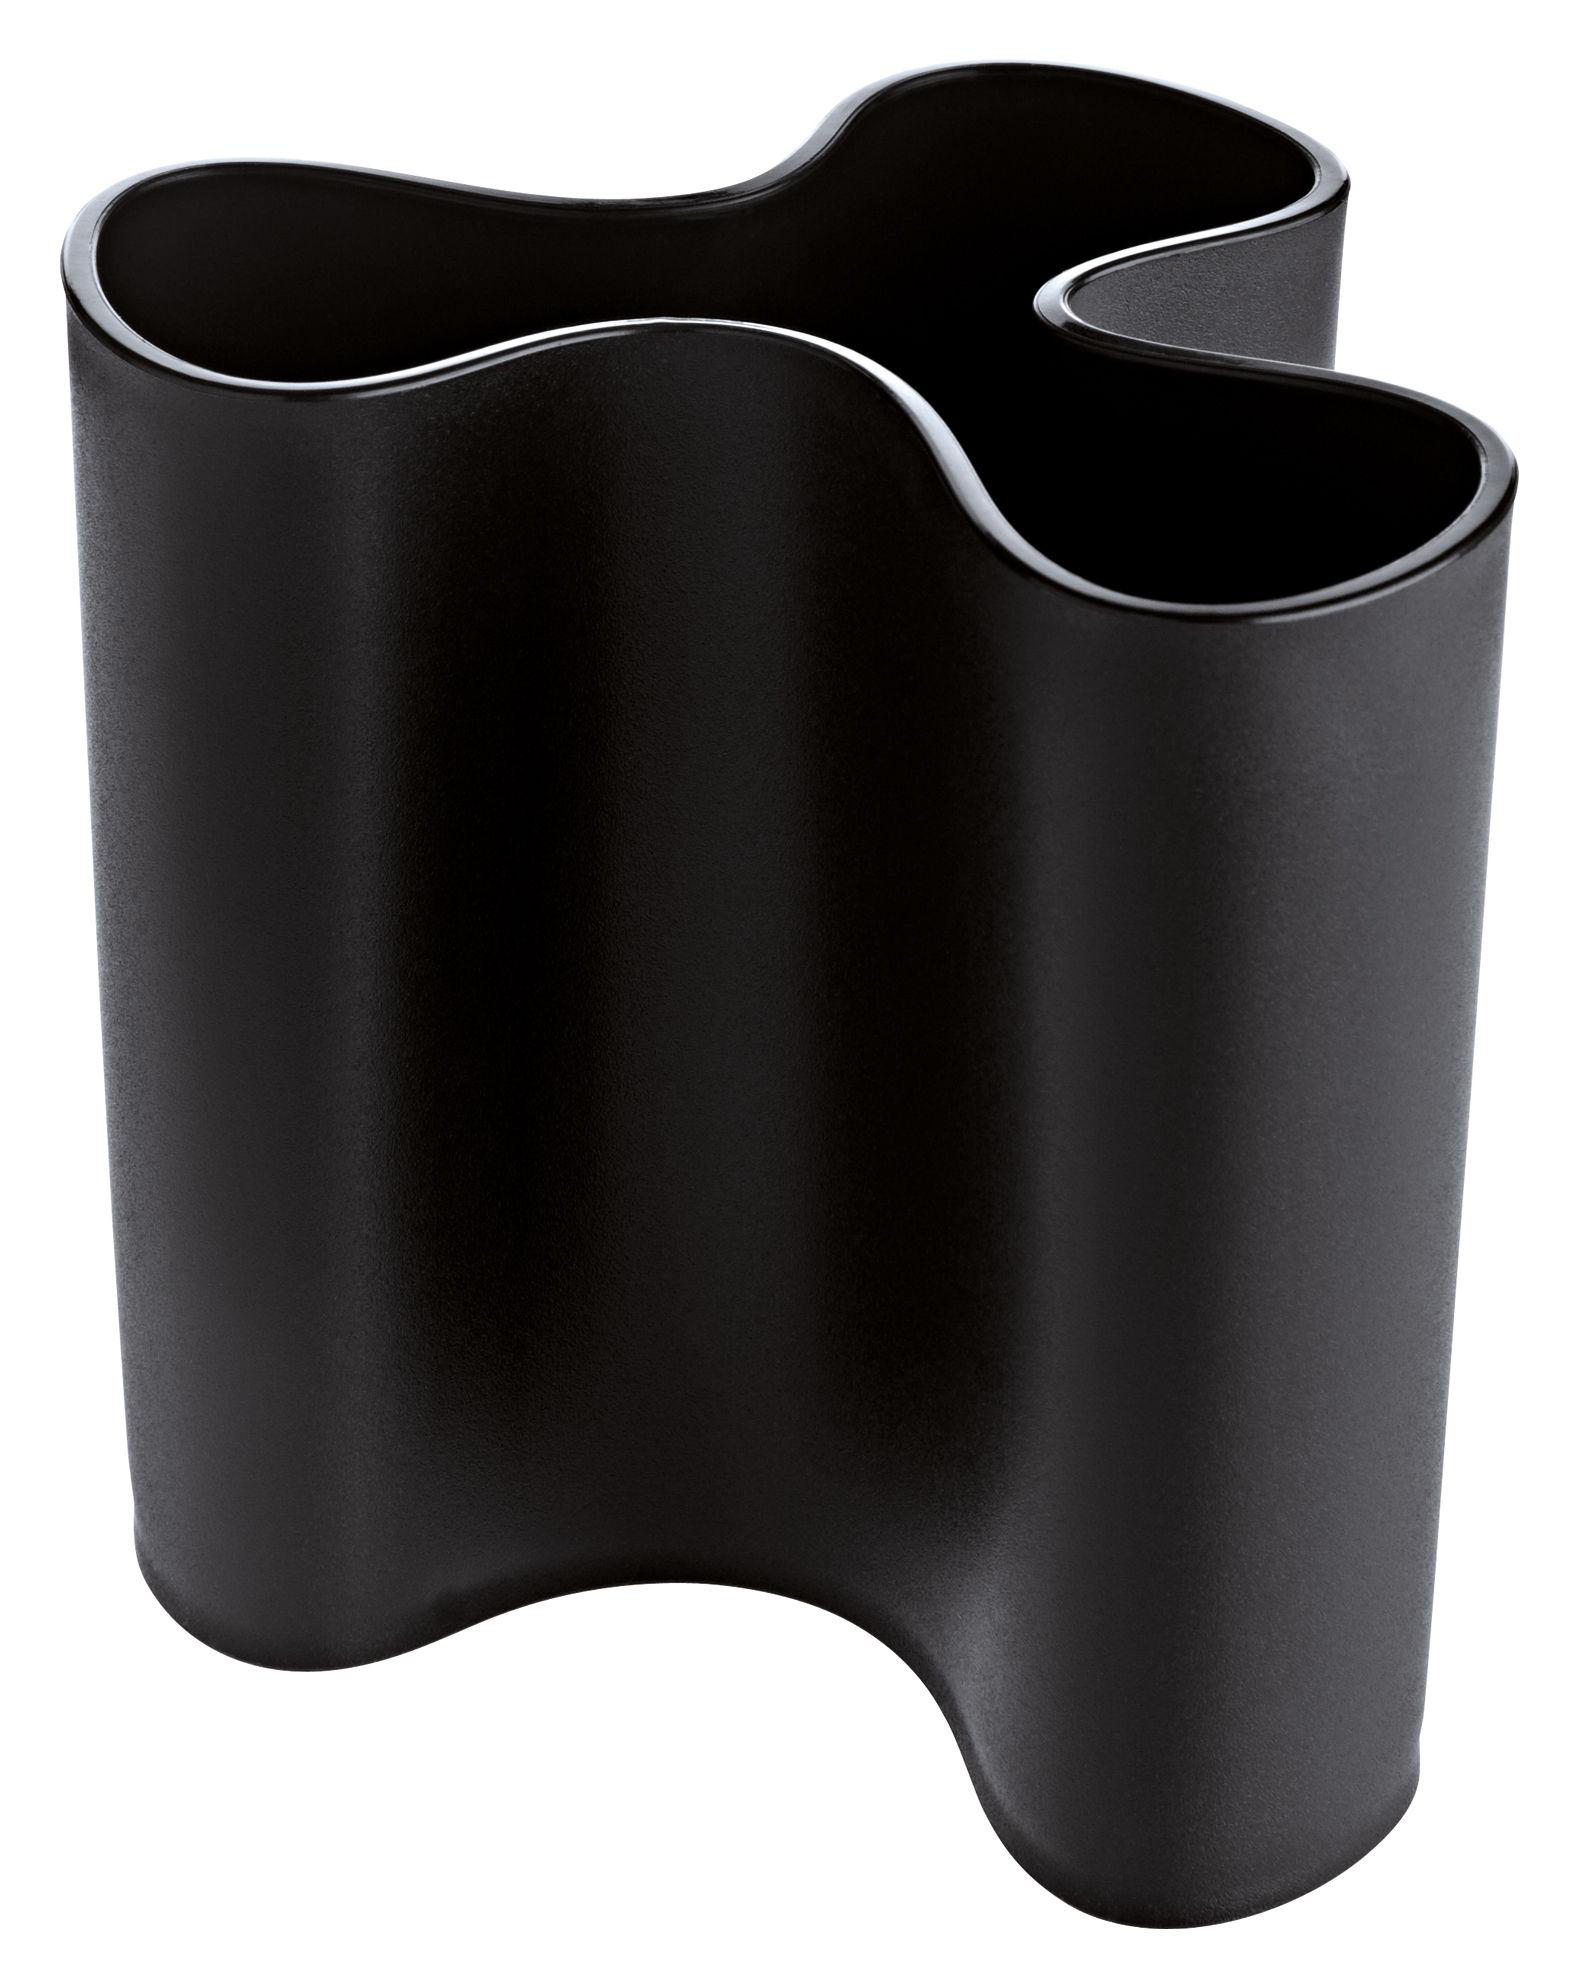 Interni - Vasi - Vaso Clara di Koziol - Nero - Materiale plastico